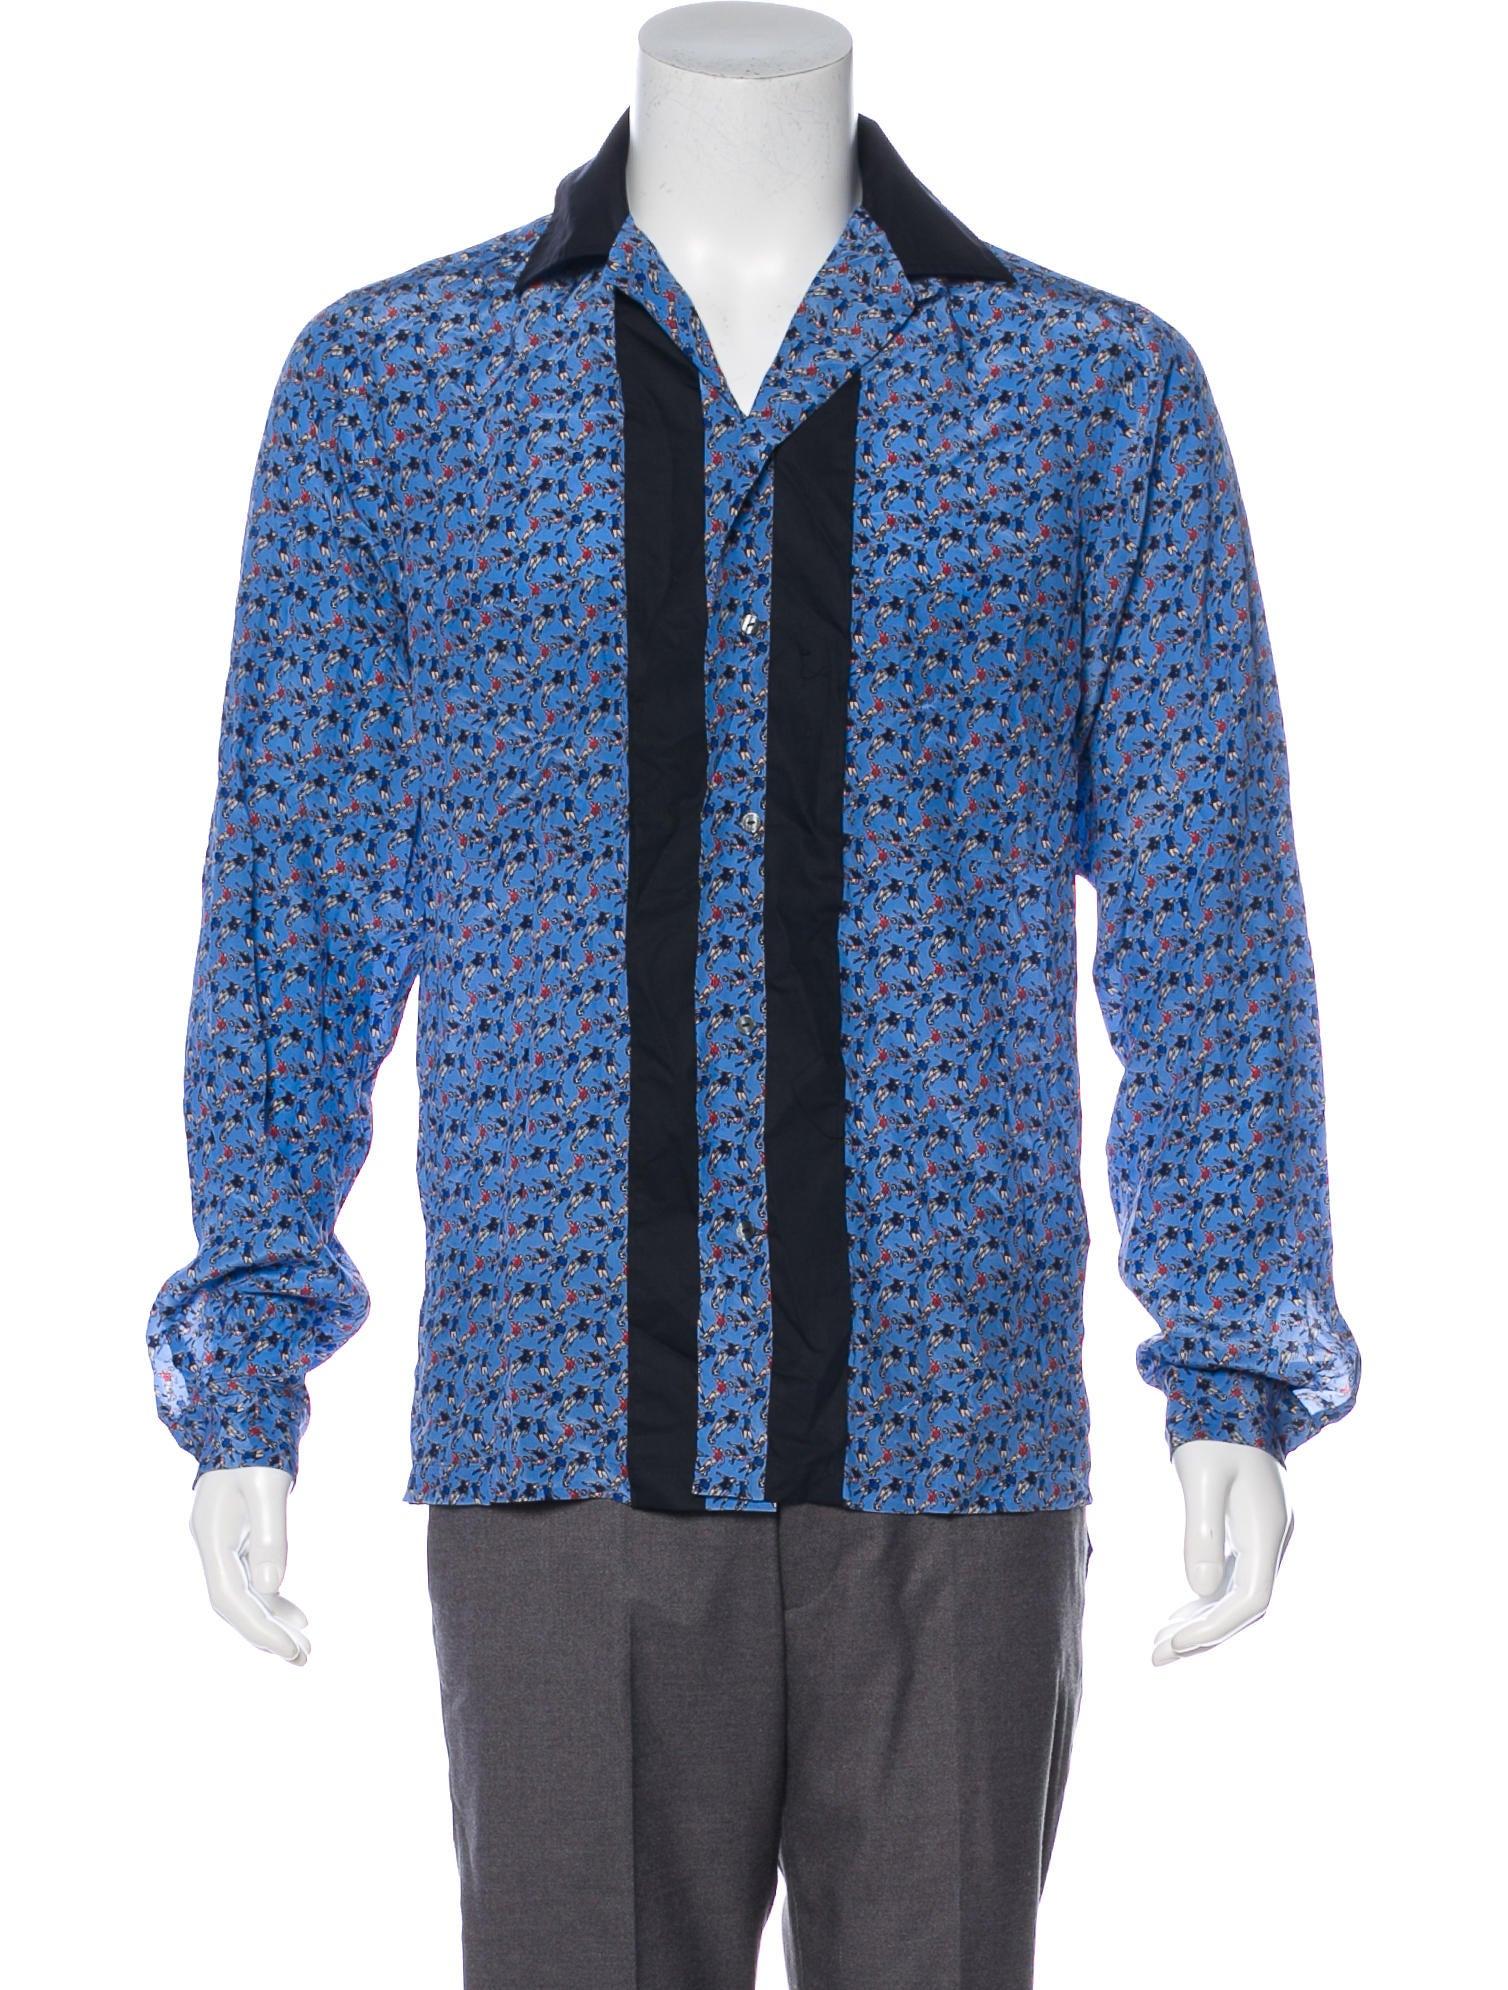 624bb7b3a1ec6a Dolce   Gabbana Silk-Blend Soccer Print Shirt w  Tags - Clothing ...